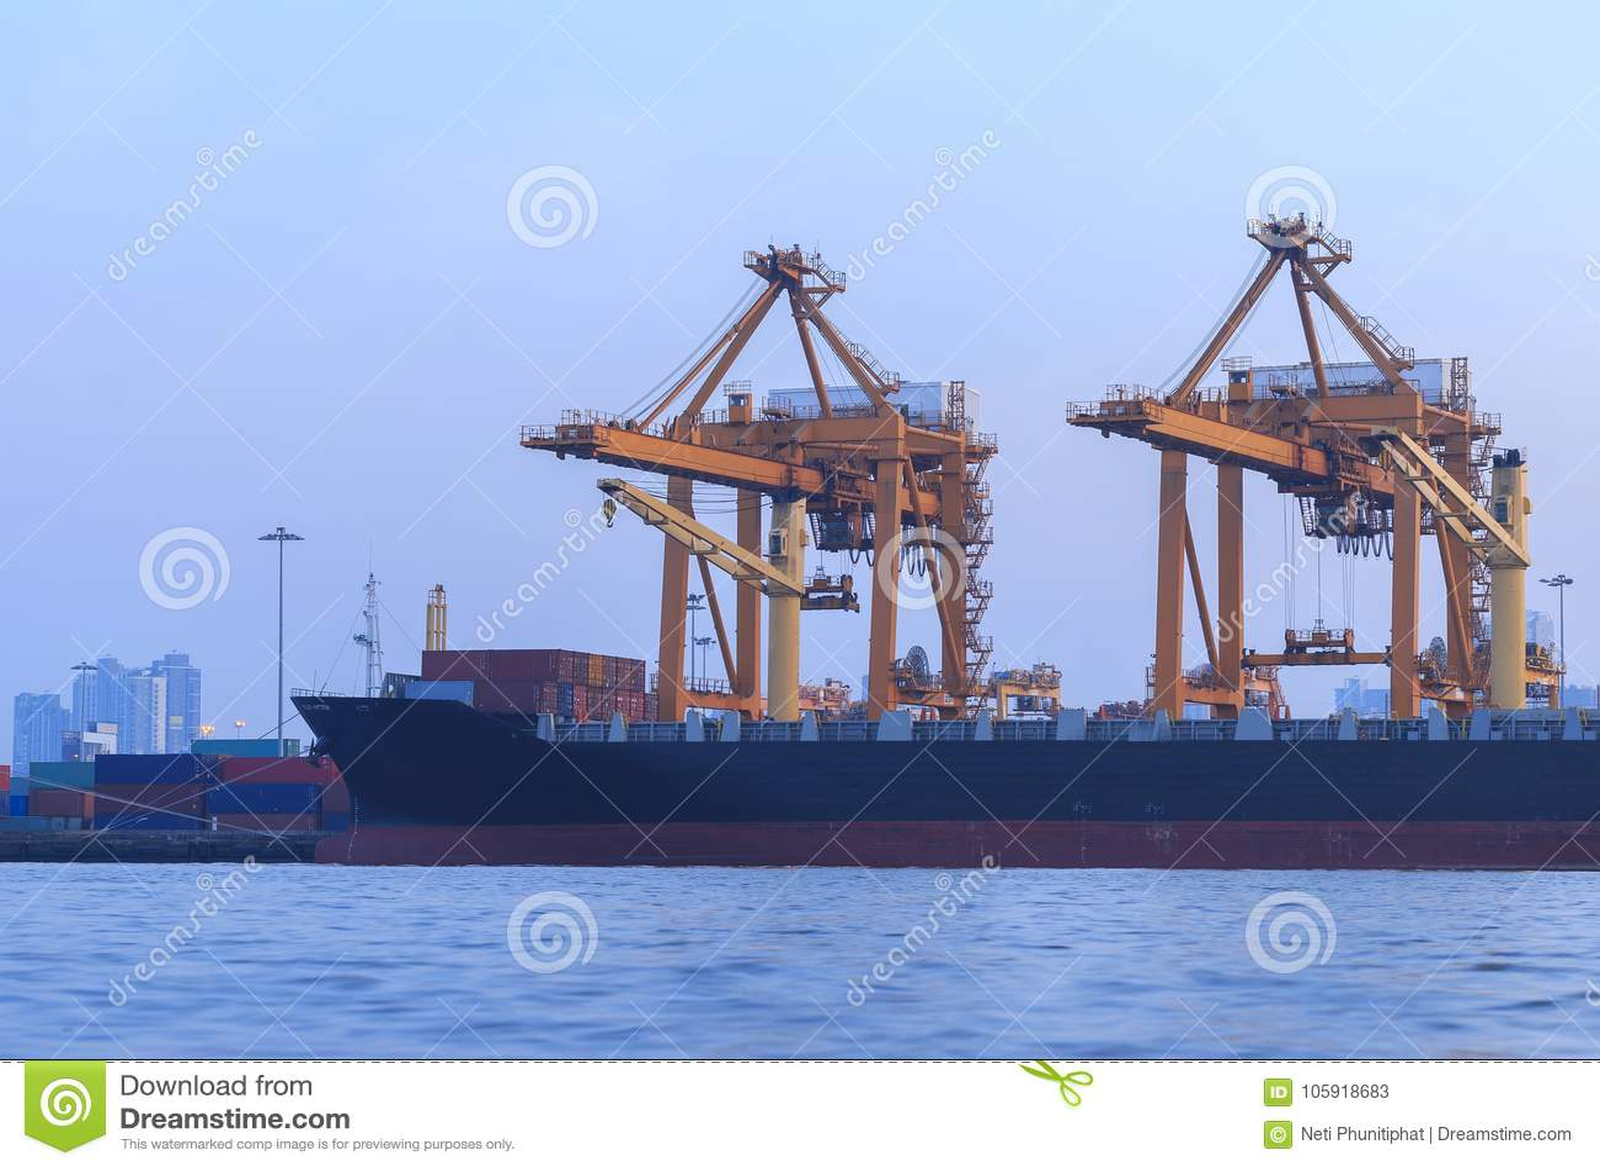 Lifter Crane In The Sea Port, Bangkok,Thailand Stock Image